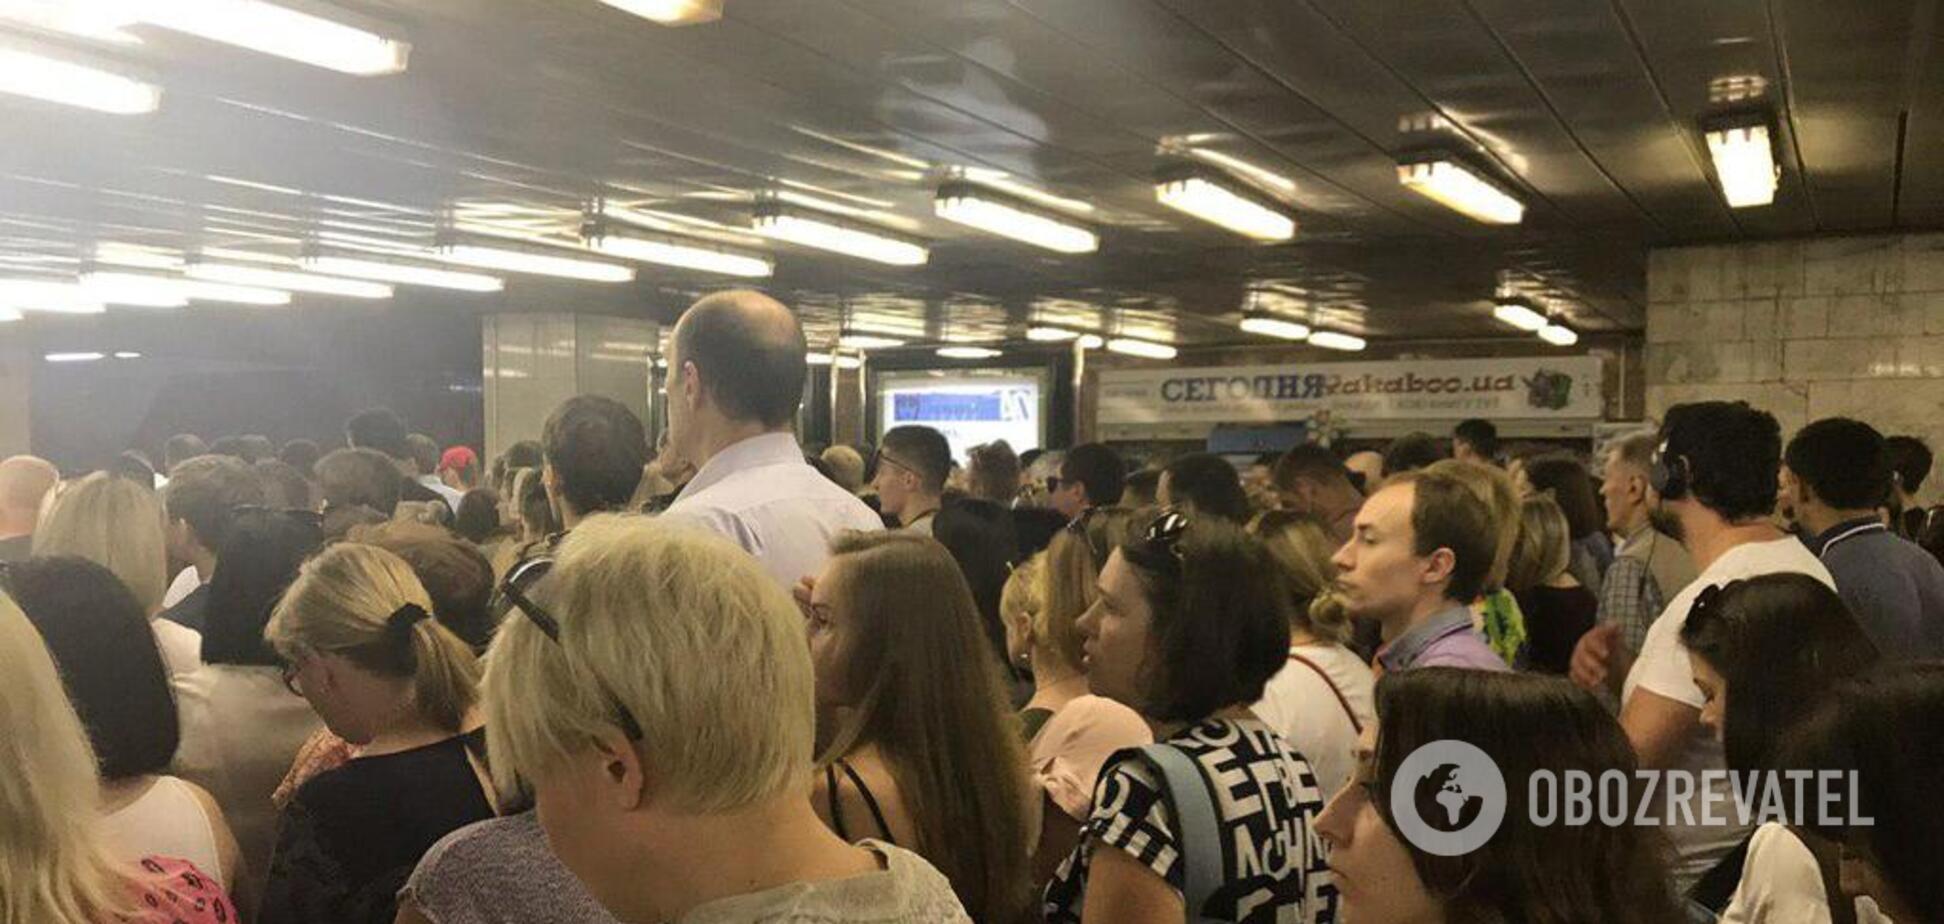 Сотни людей в очереди! На станциях метро Киева произошел пассажирский 'коллапс'